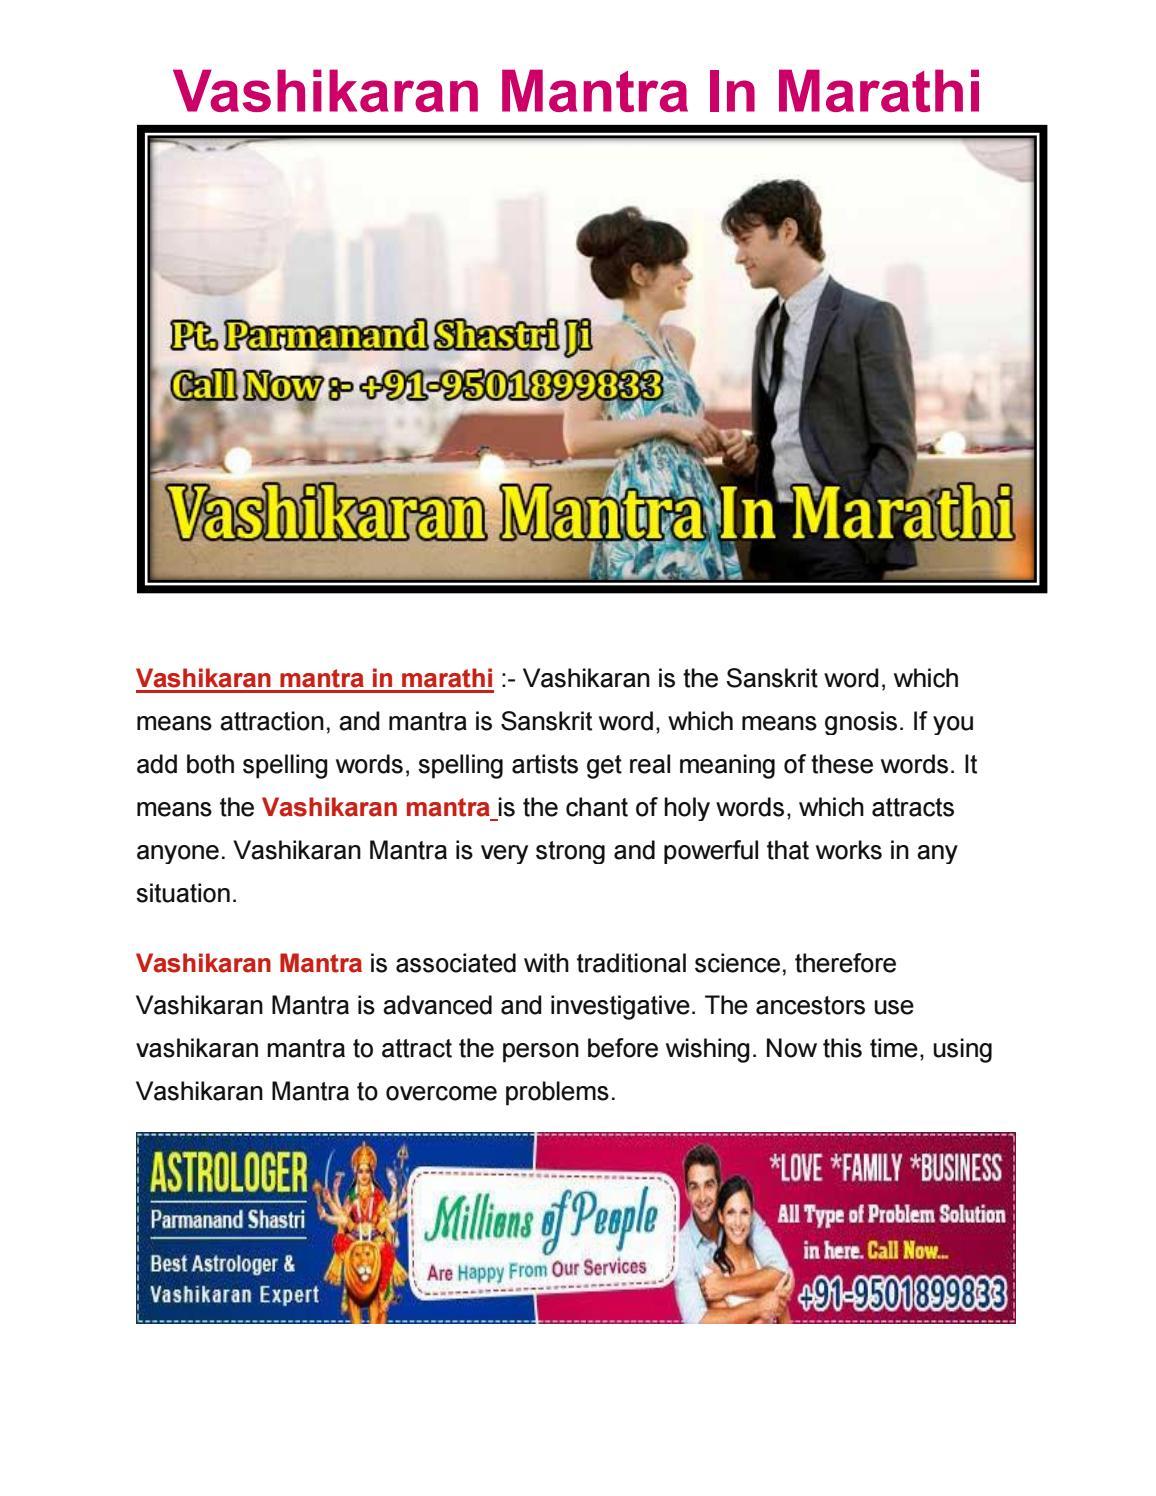 Vashikaran mantra in marathi | 100% Guarantee | +91